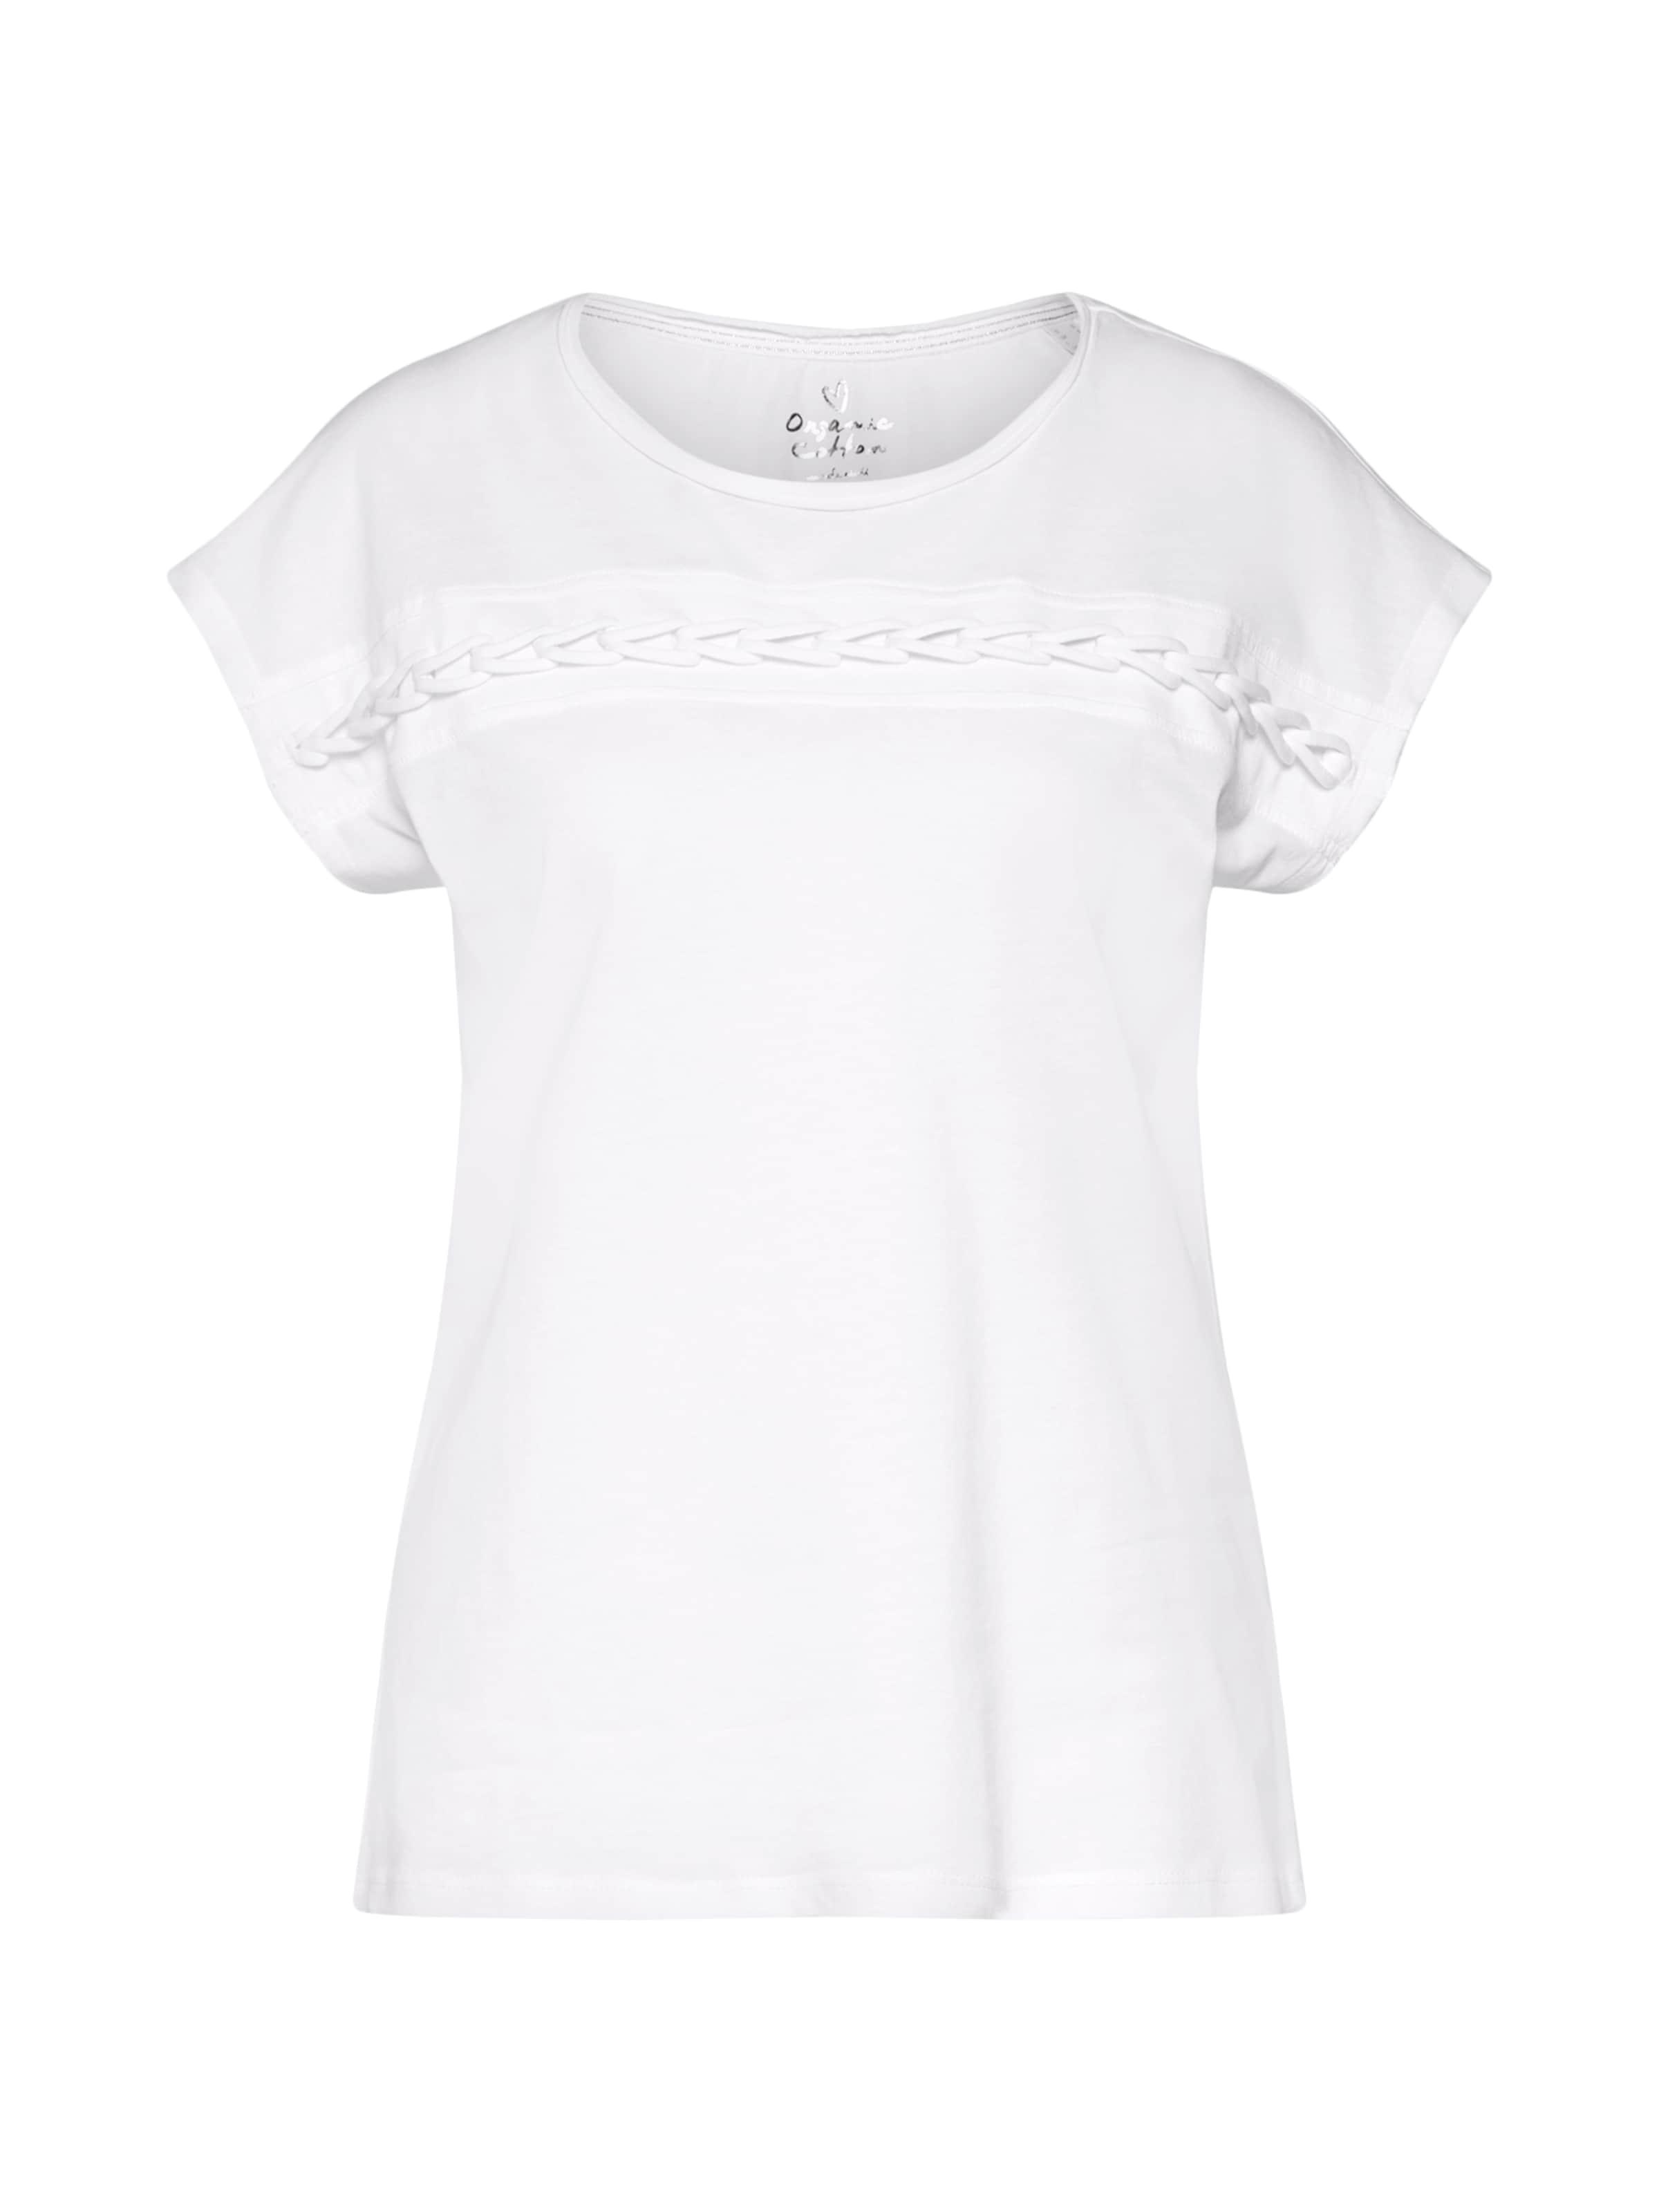 T T Blanc shirt shirt Blanc En En Esprit T Esprit Esprit shirt Yn118Bqw6S